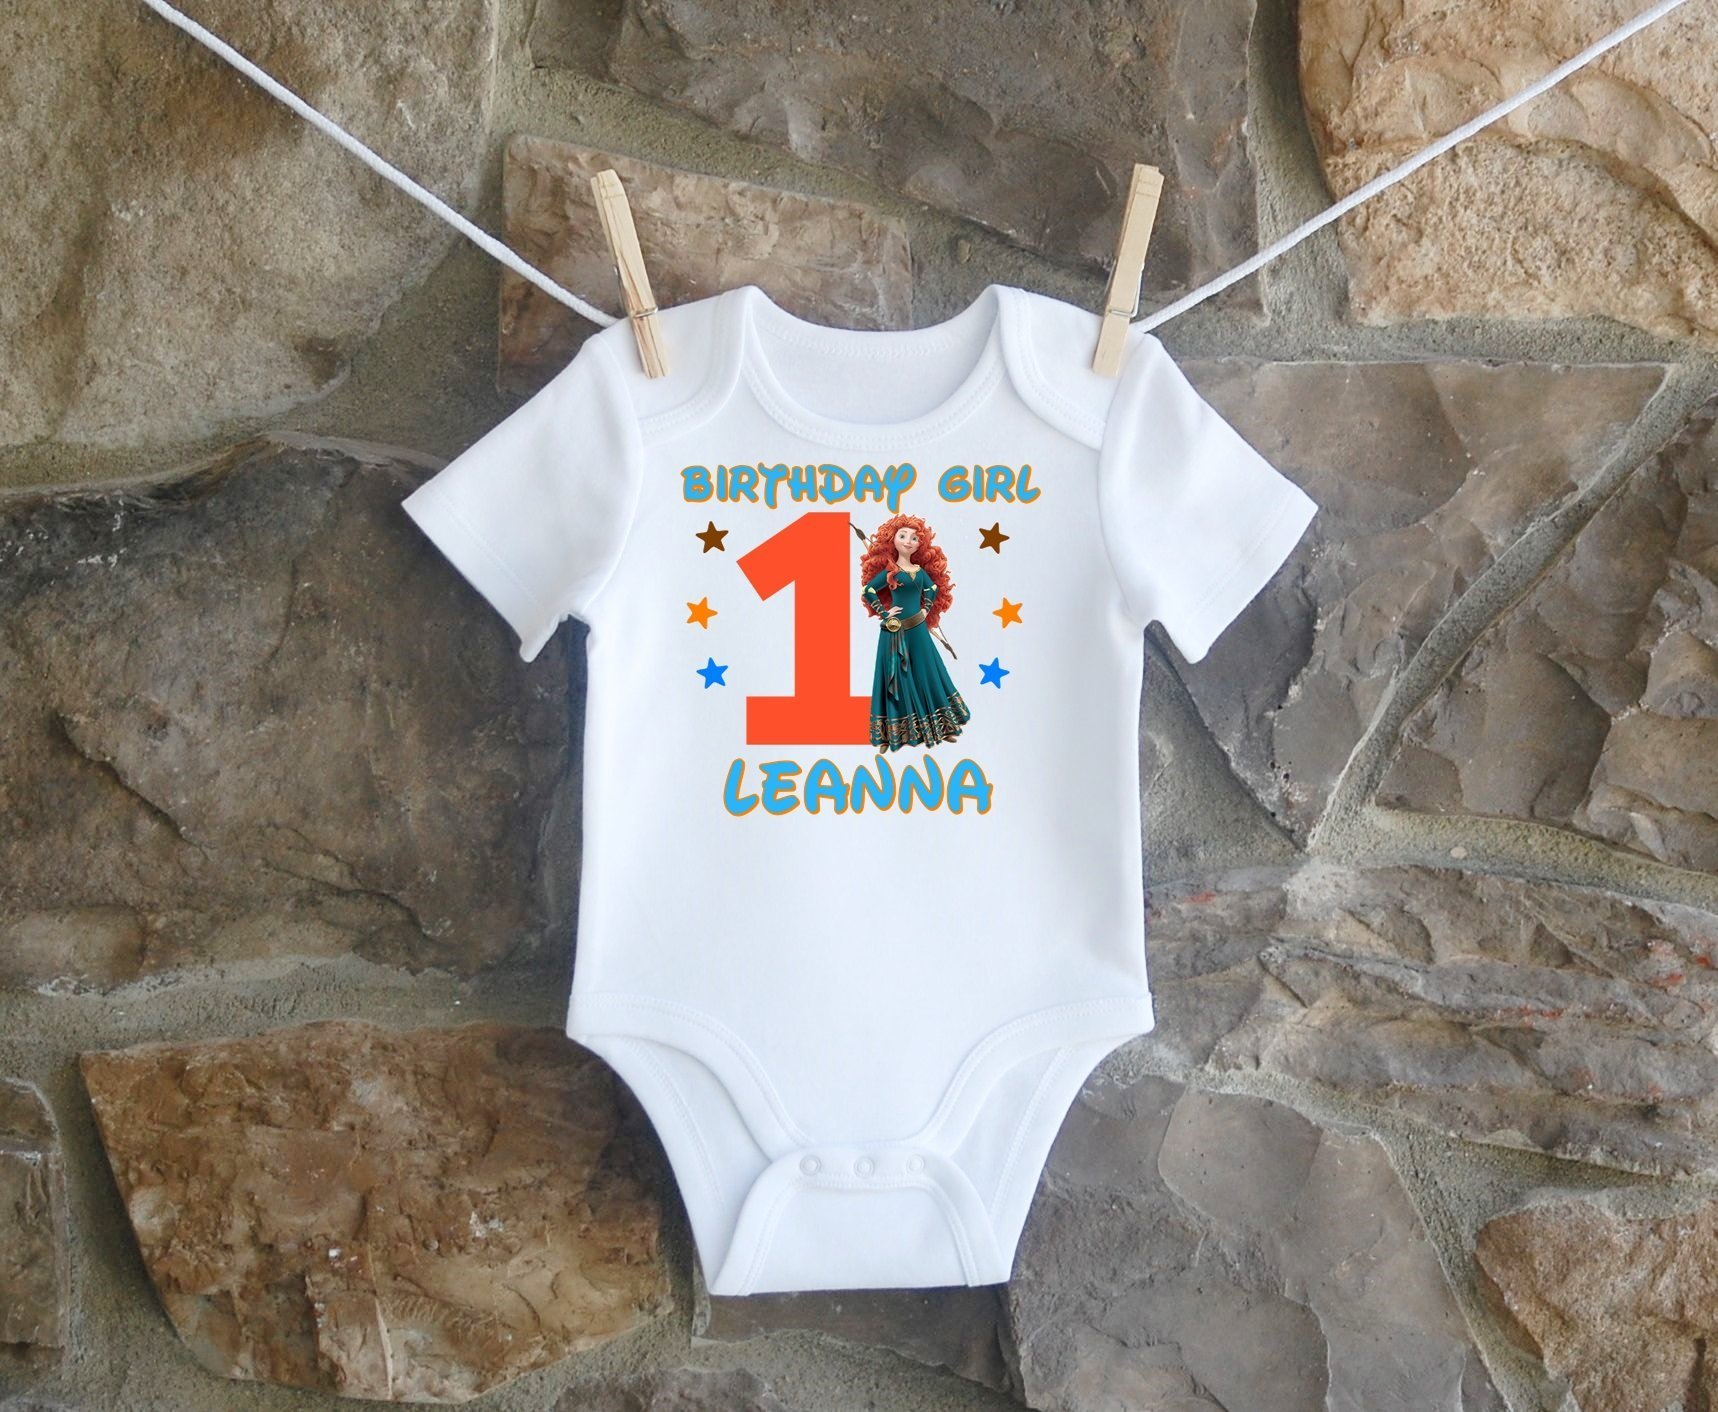 Merida Birthday Shirt, Merida Birthday Shirt For Girls, Personalized Girls Brave Merida Birthday Shirt, Customized Brave Merida Birthday Shirt